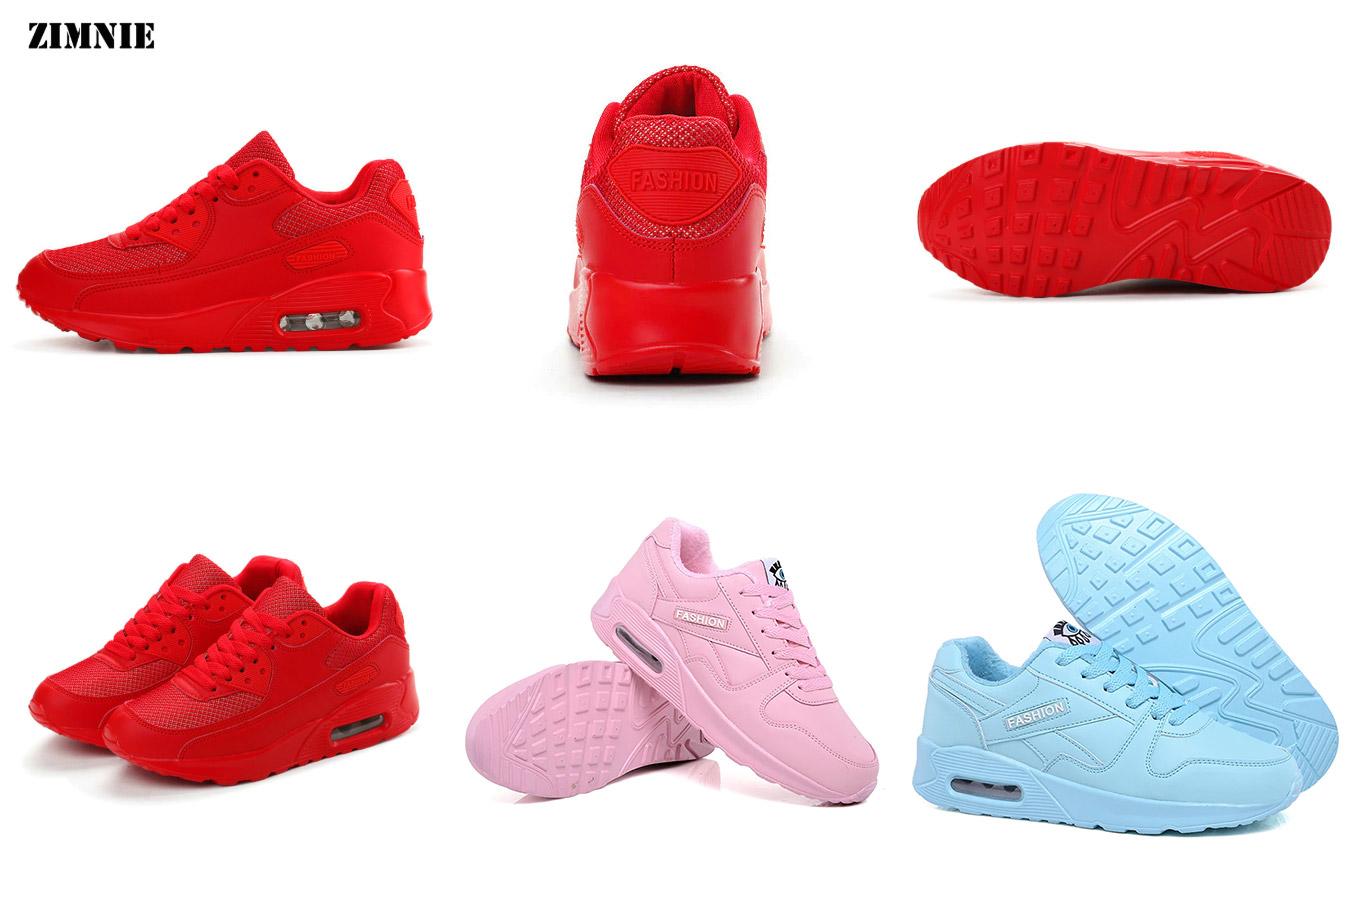 Аналог женских кроссовок Air Max